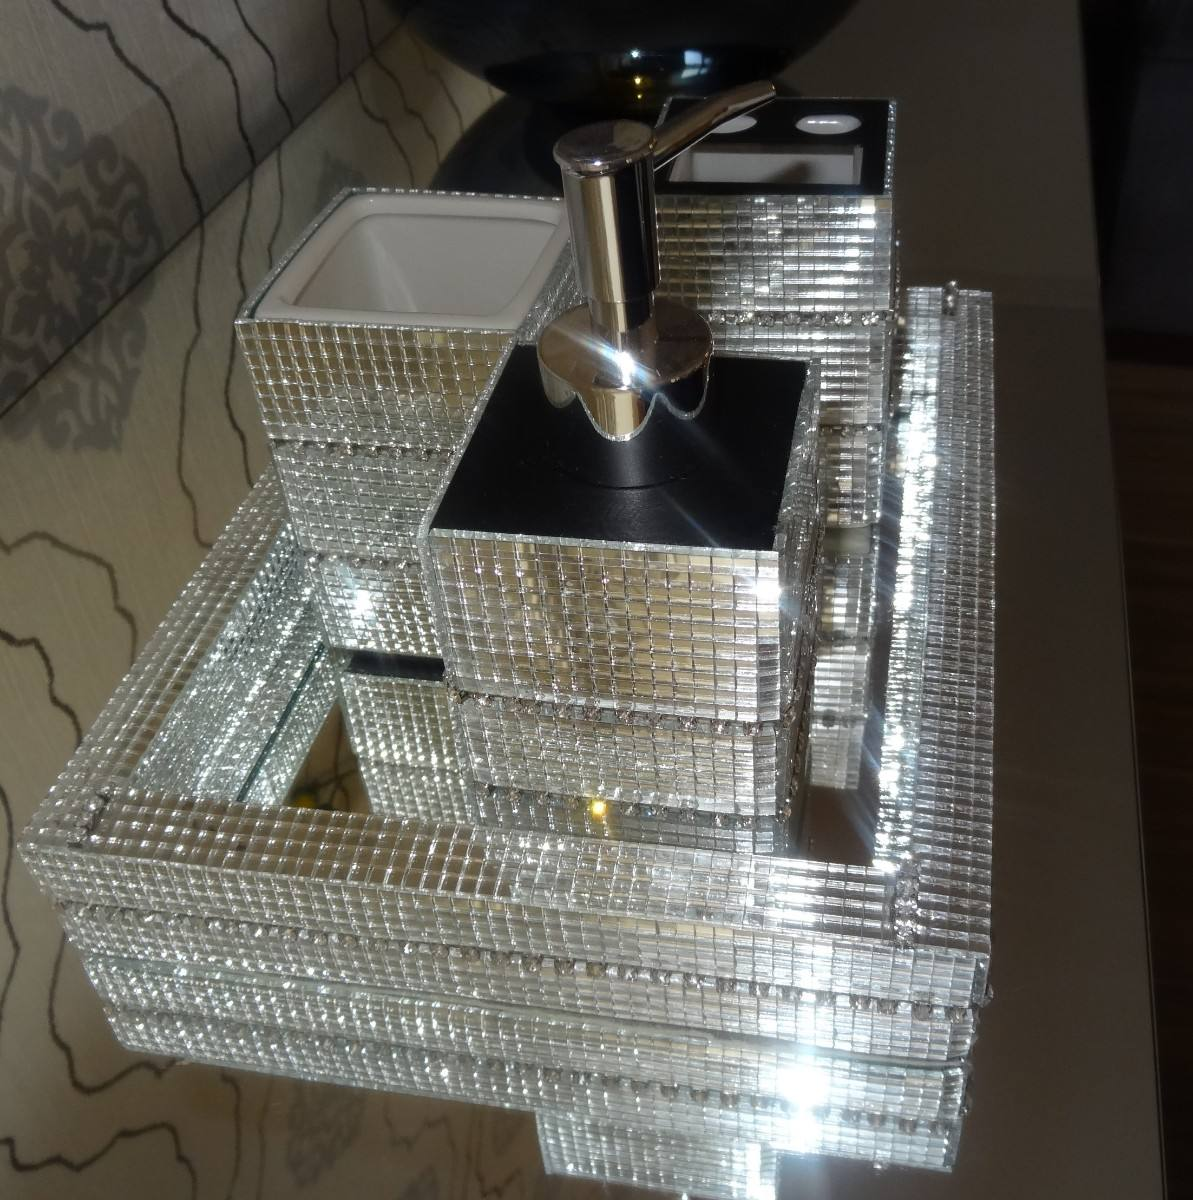 Kit Lavabo/banheiro 3 Pç (bandeja/saboneteira Liquida Etc) R$ 195  #575142 1193 1200